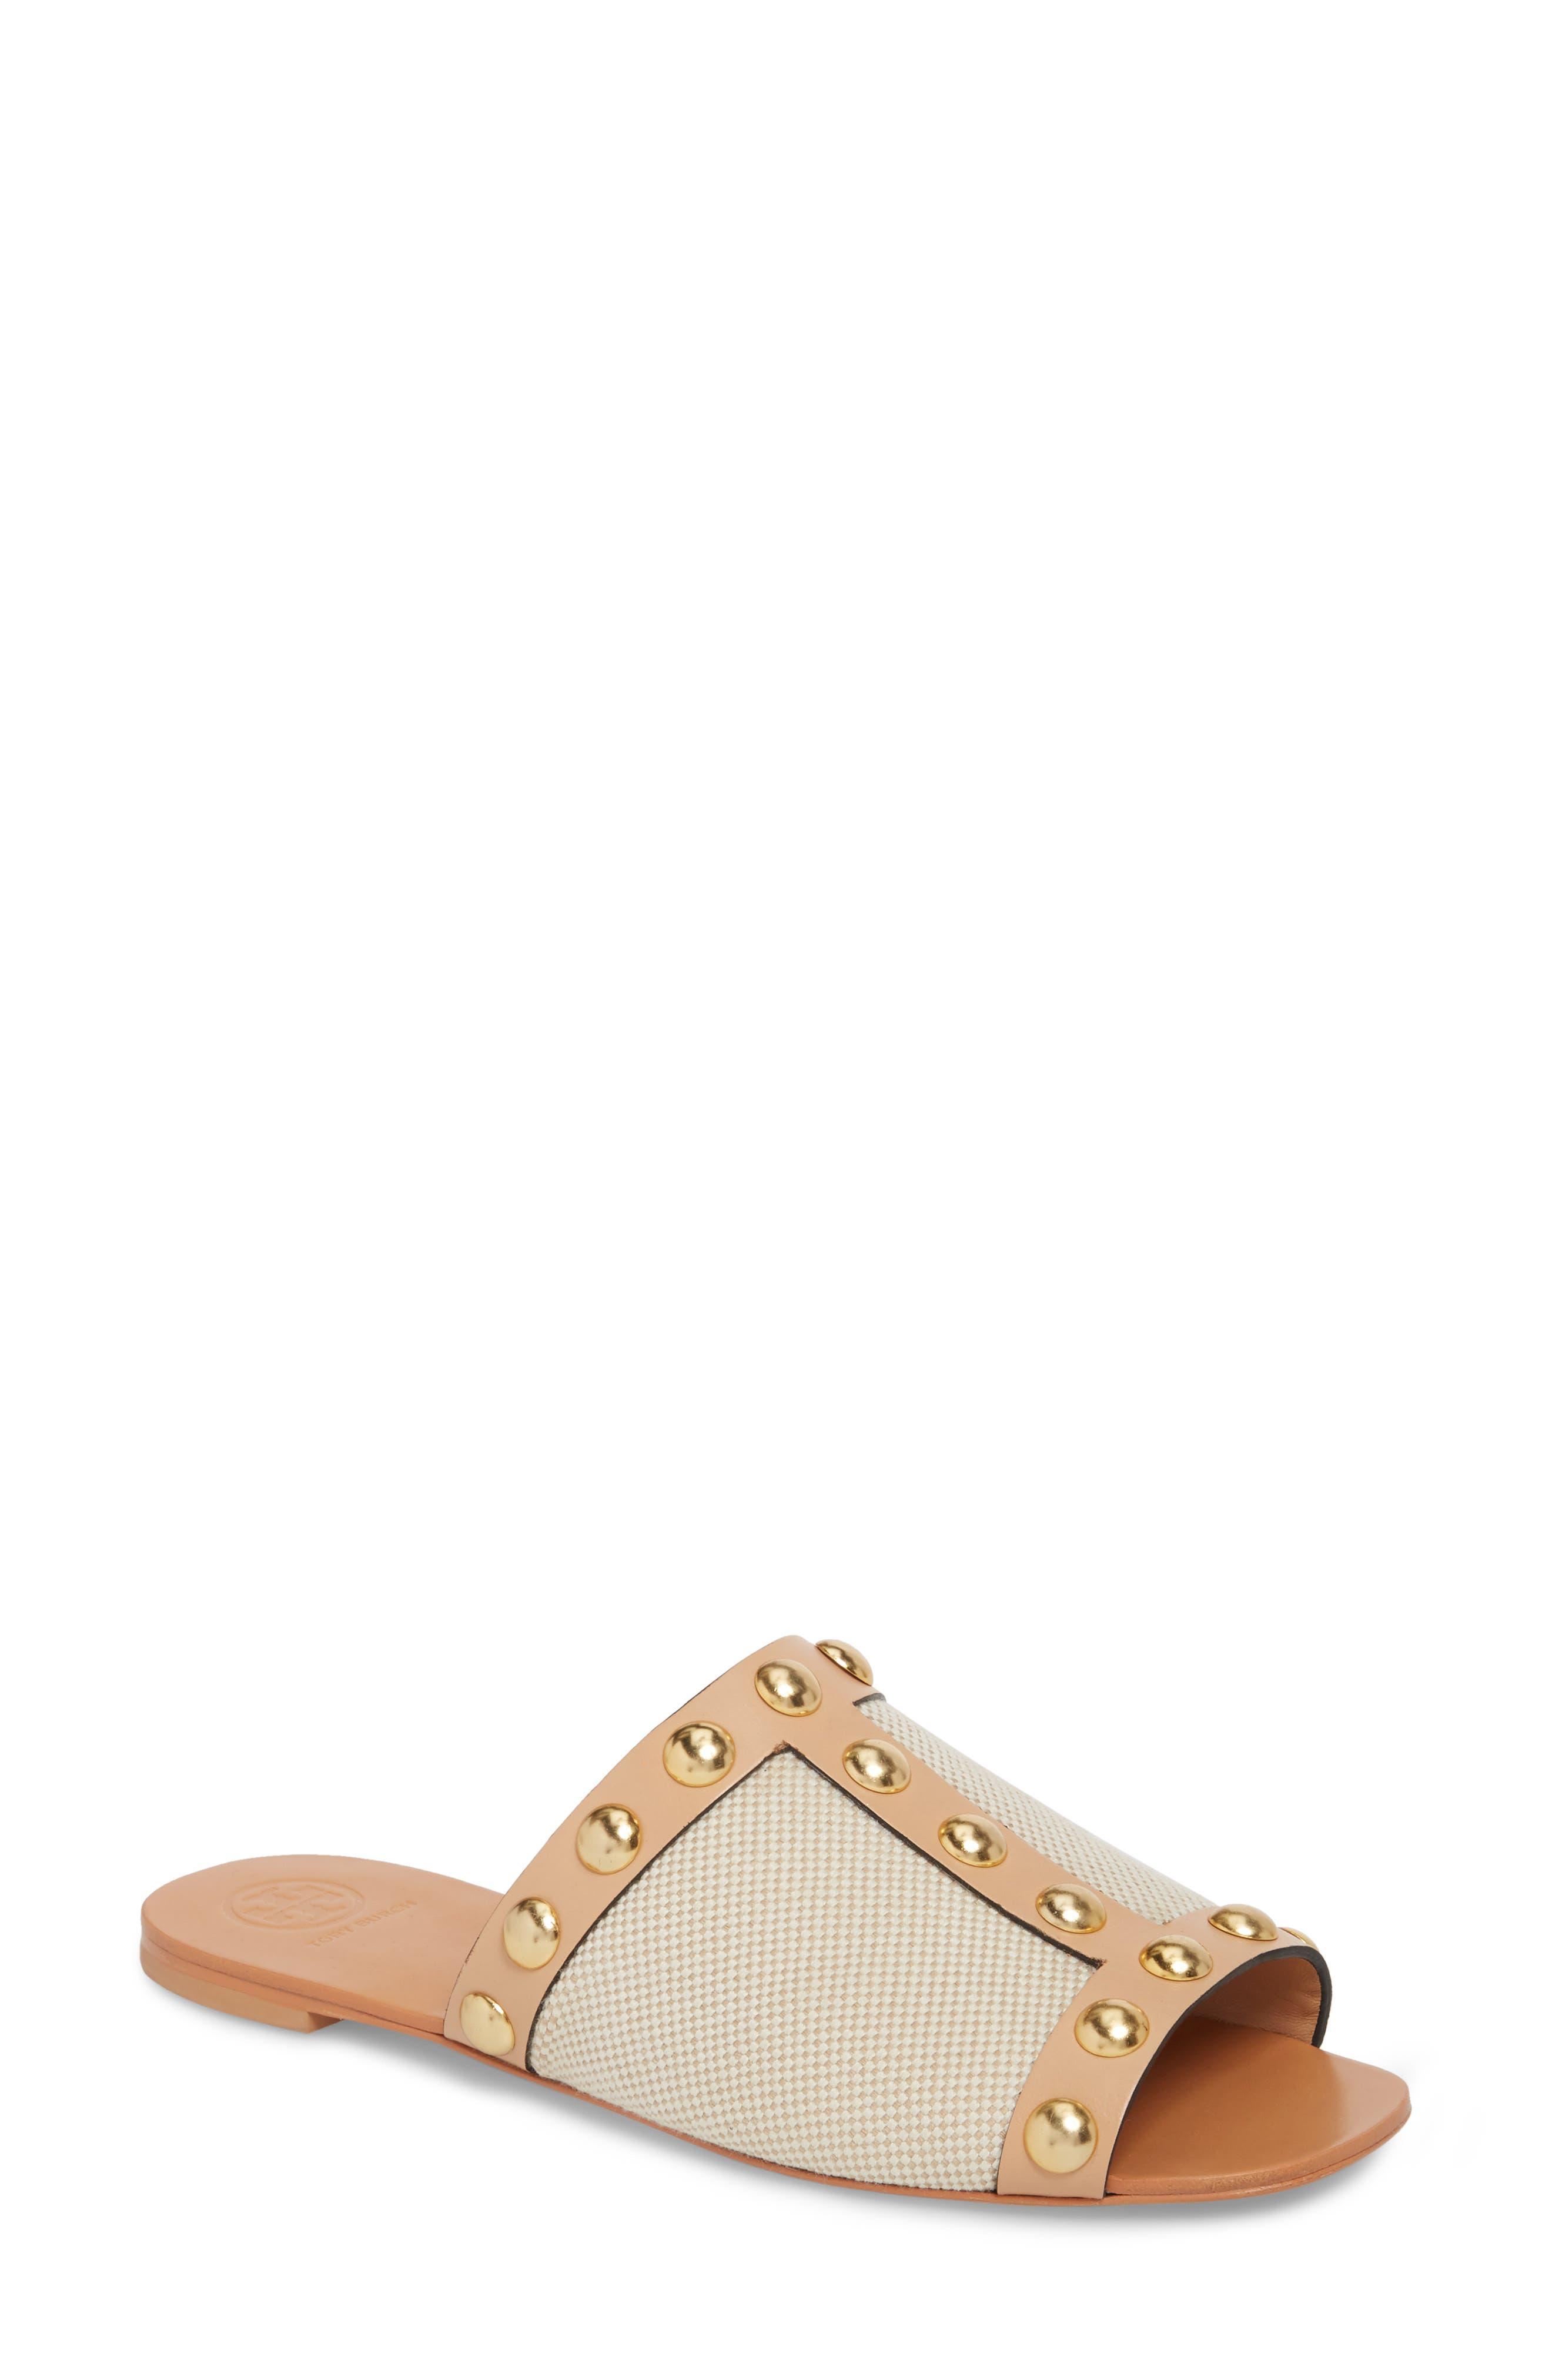 Blythe Slide Sandal,                             Main thumbnail 1, color,                             Sand/ Natural Vachetta